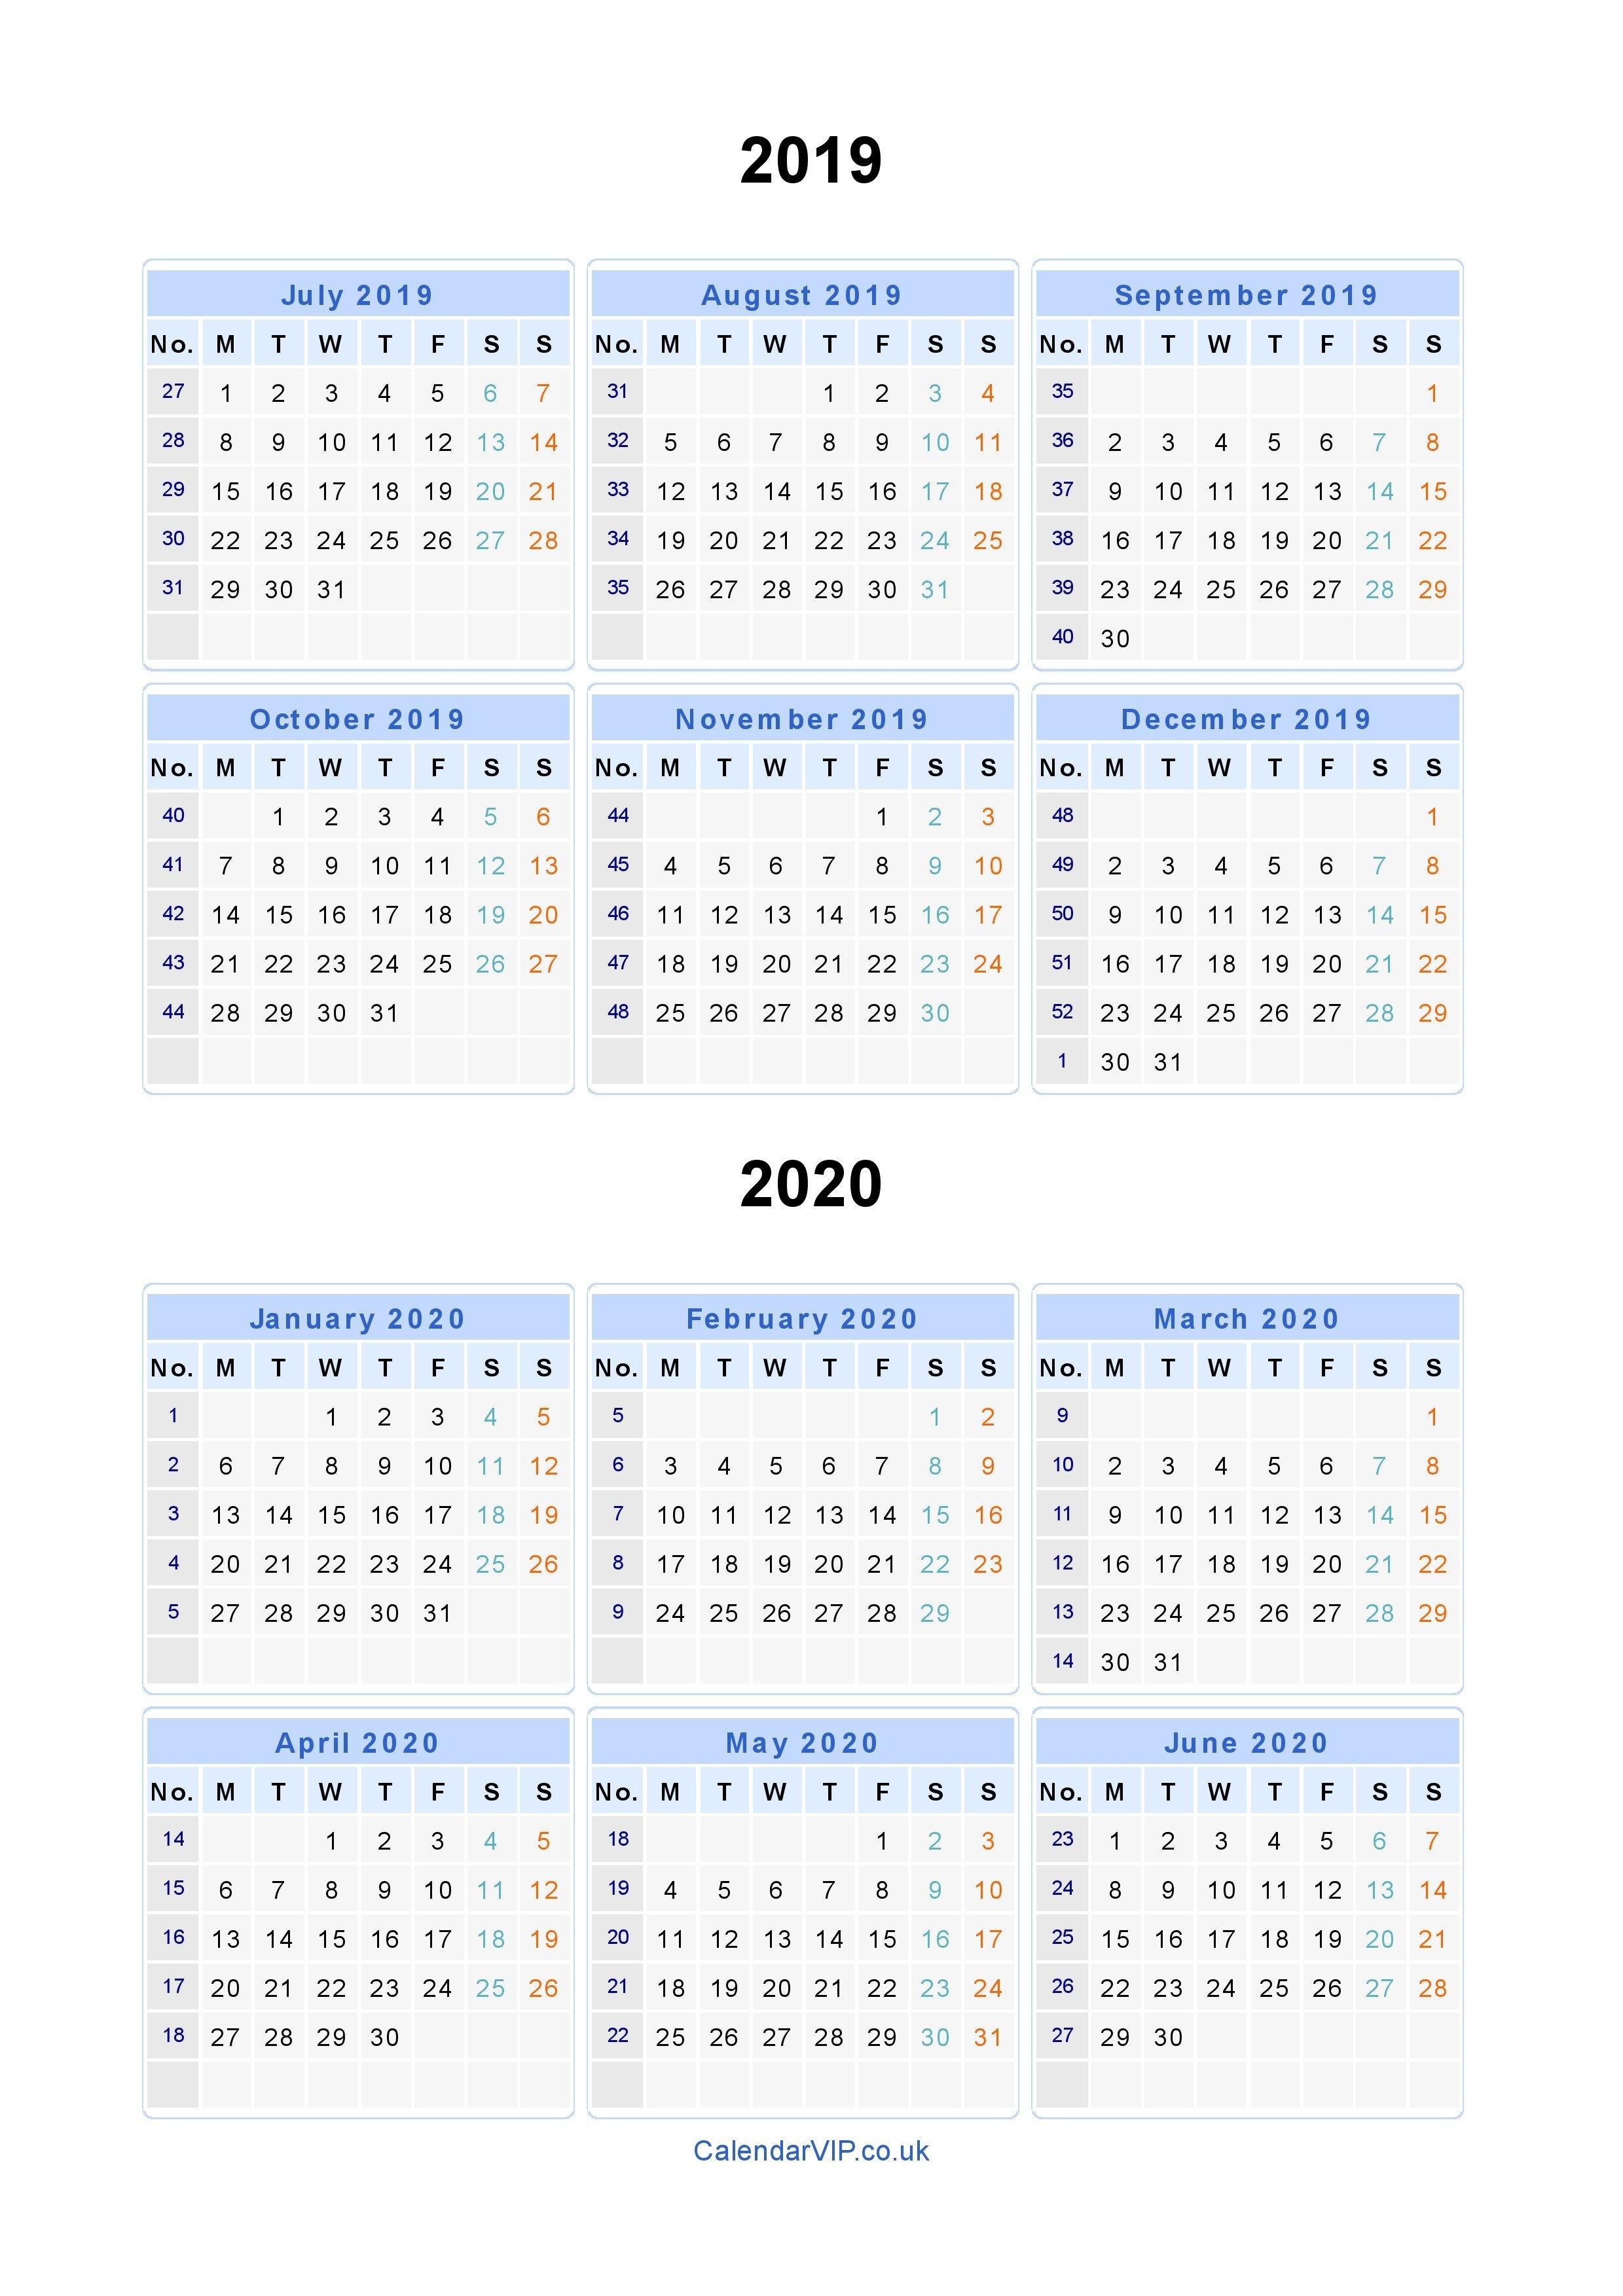 Split Year Calendars 2019 2020 – Calendar From July 2019 To June 2020 Calendar 2019 And 2020